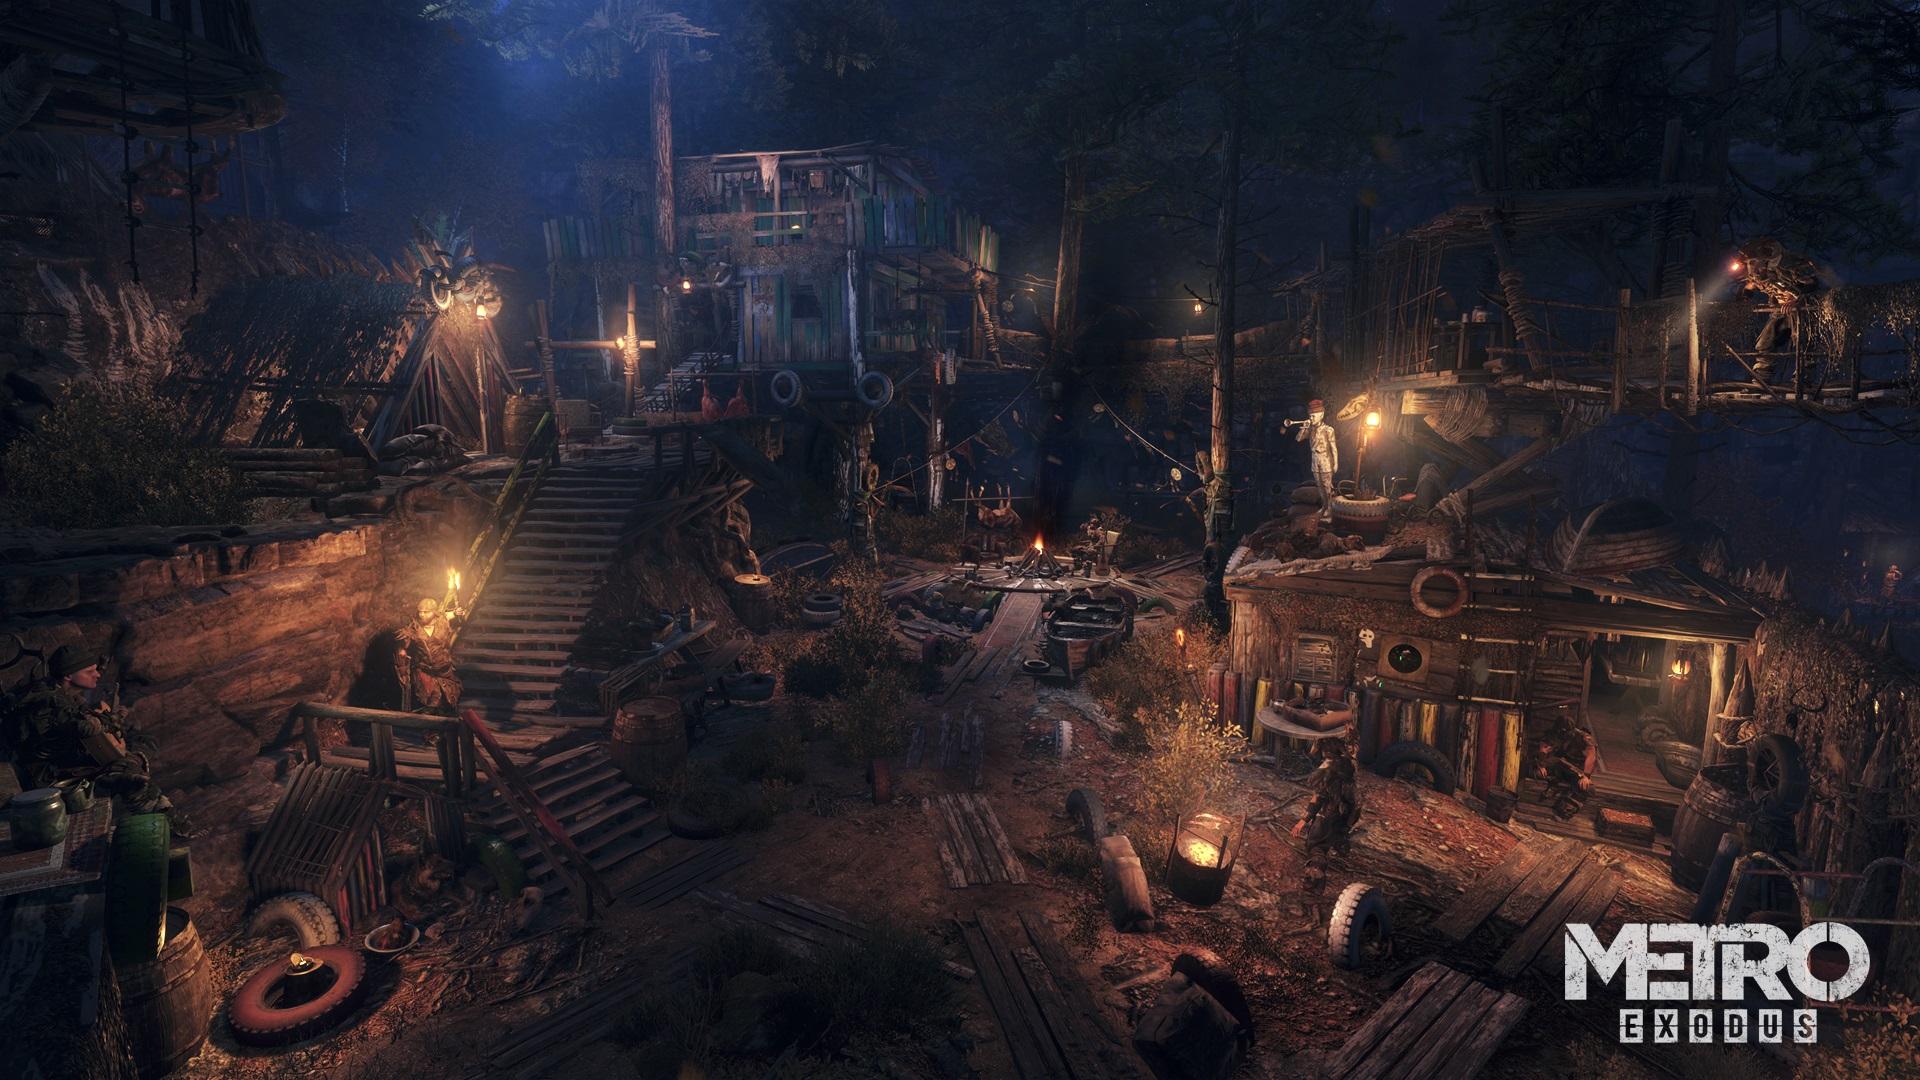 Metro Exodus Screenshot Preview Gamescom 2018 Deep Silver Ego-Shooter Shooter